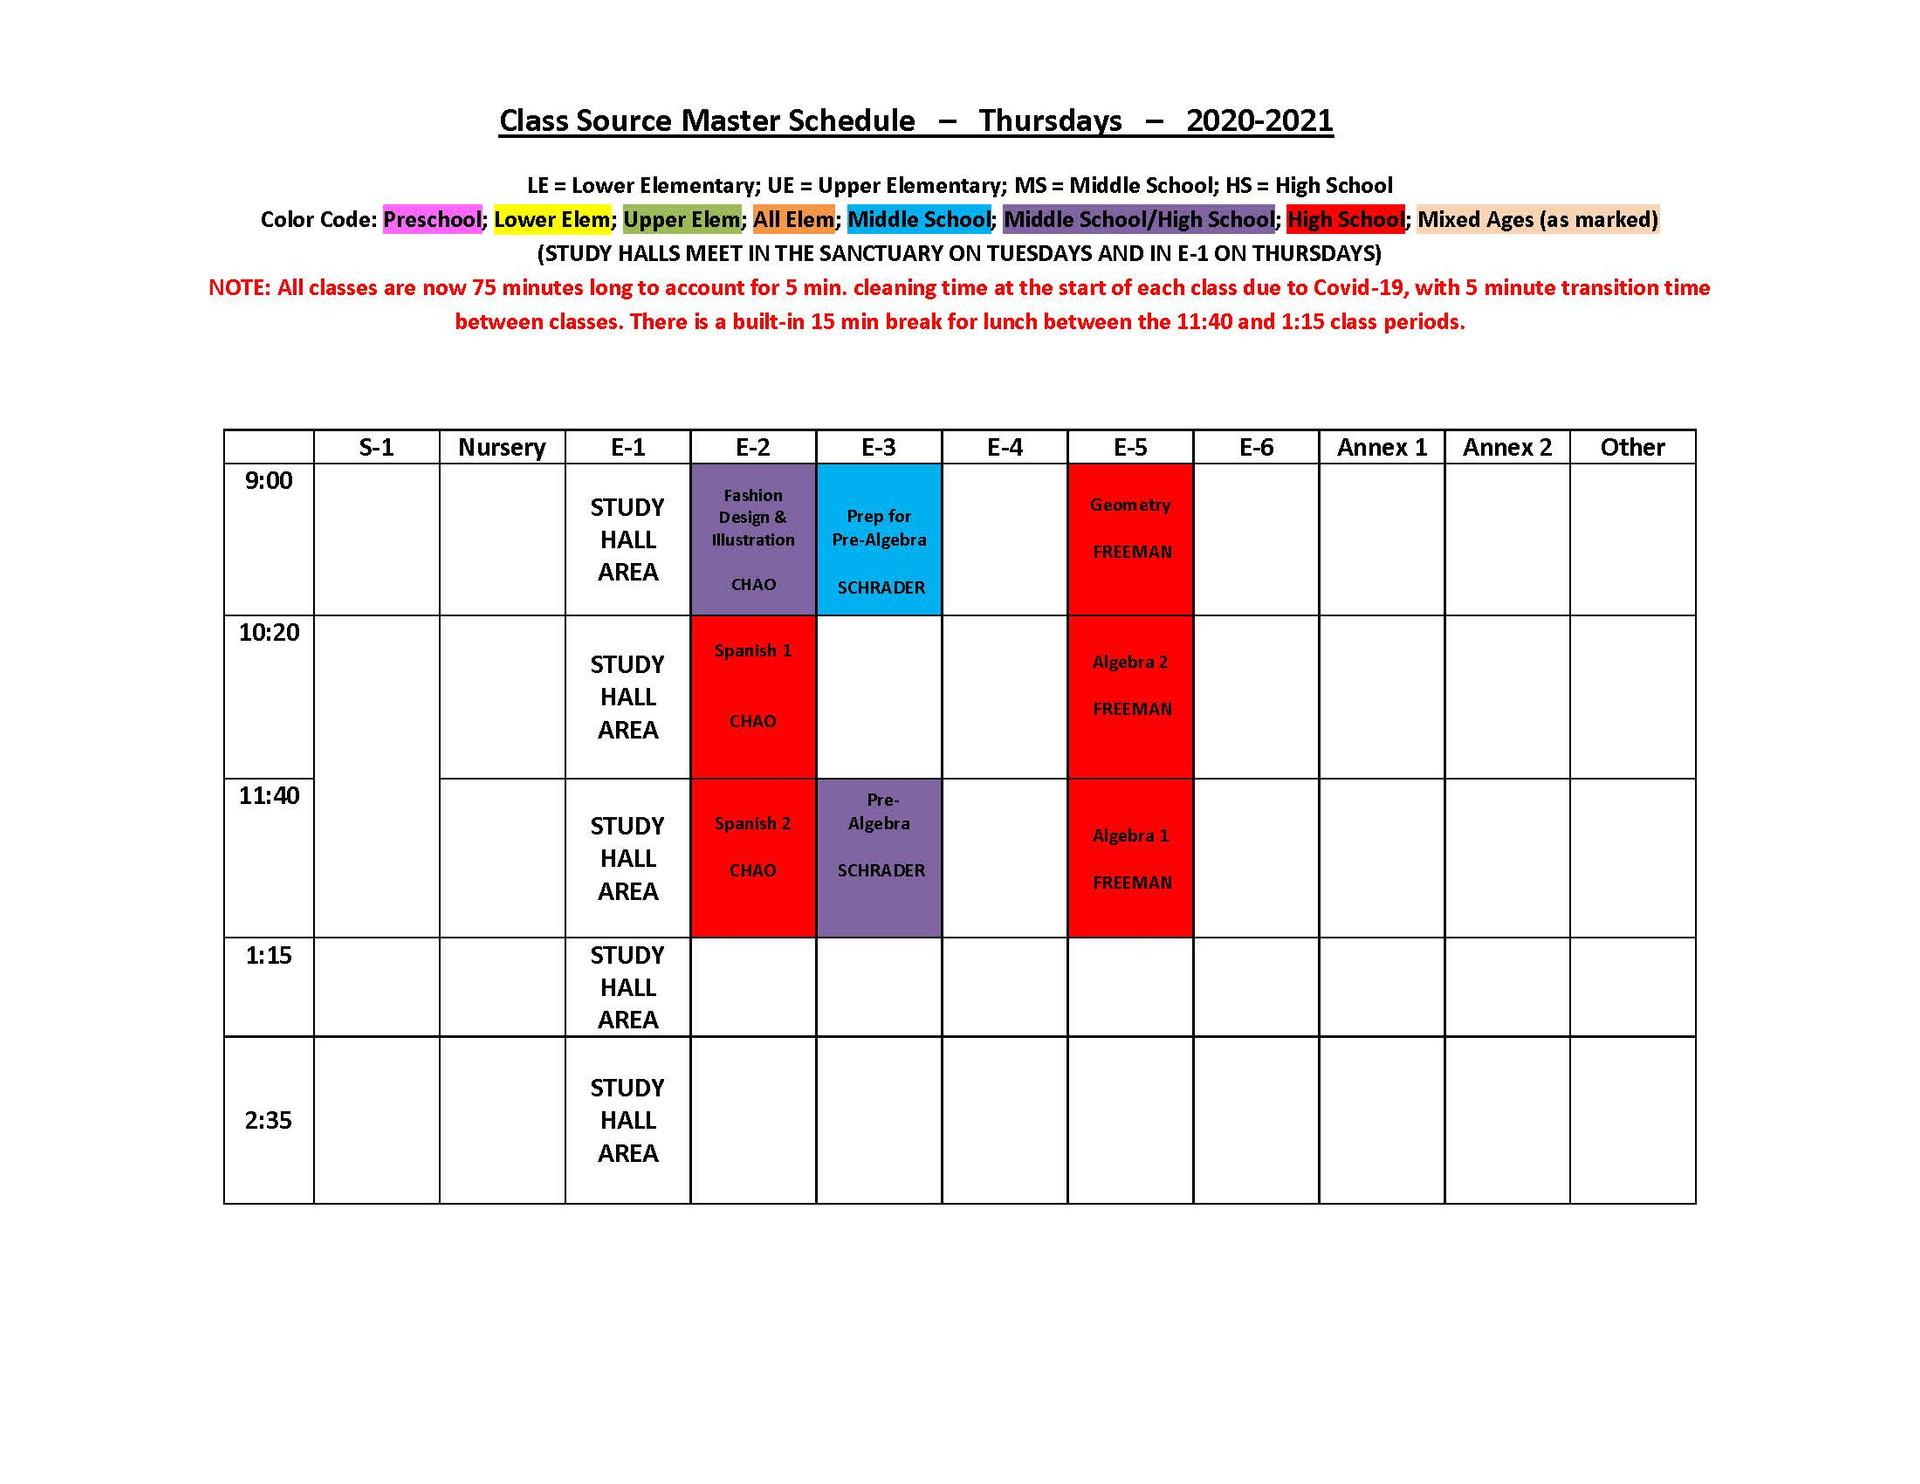 2020-2021 THURSDAY Schedule